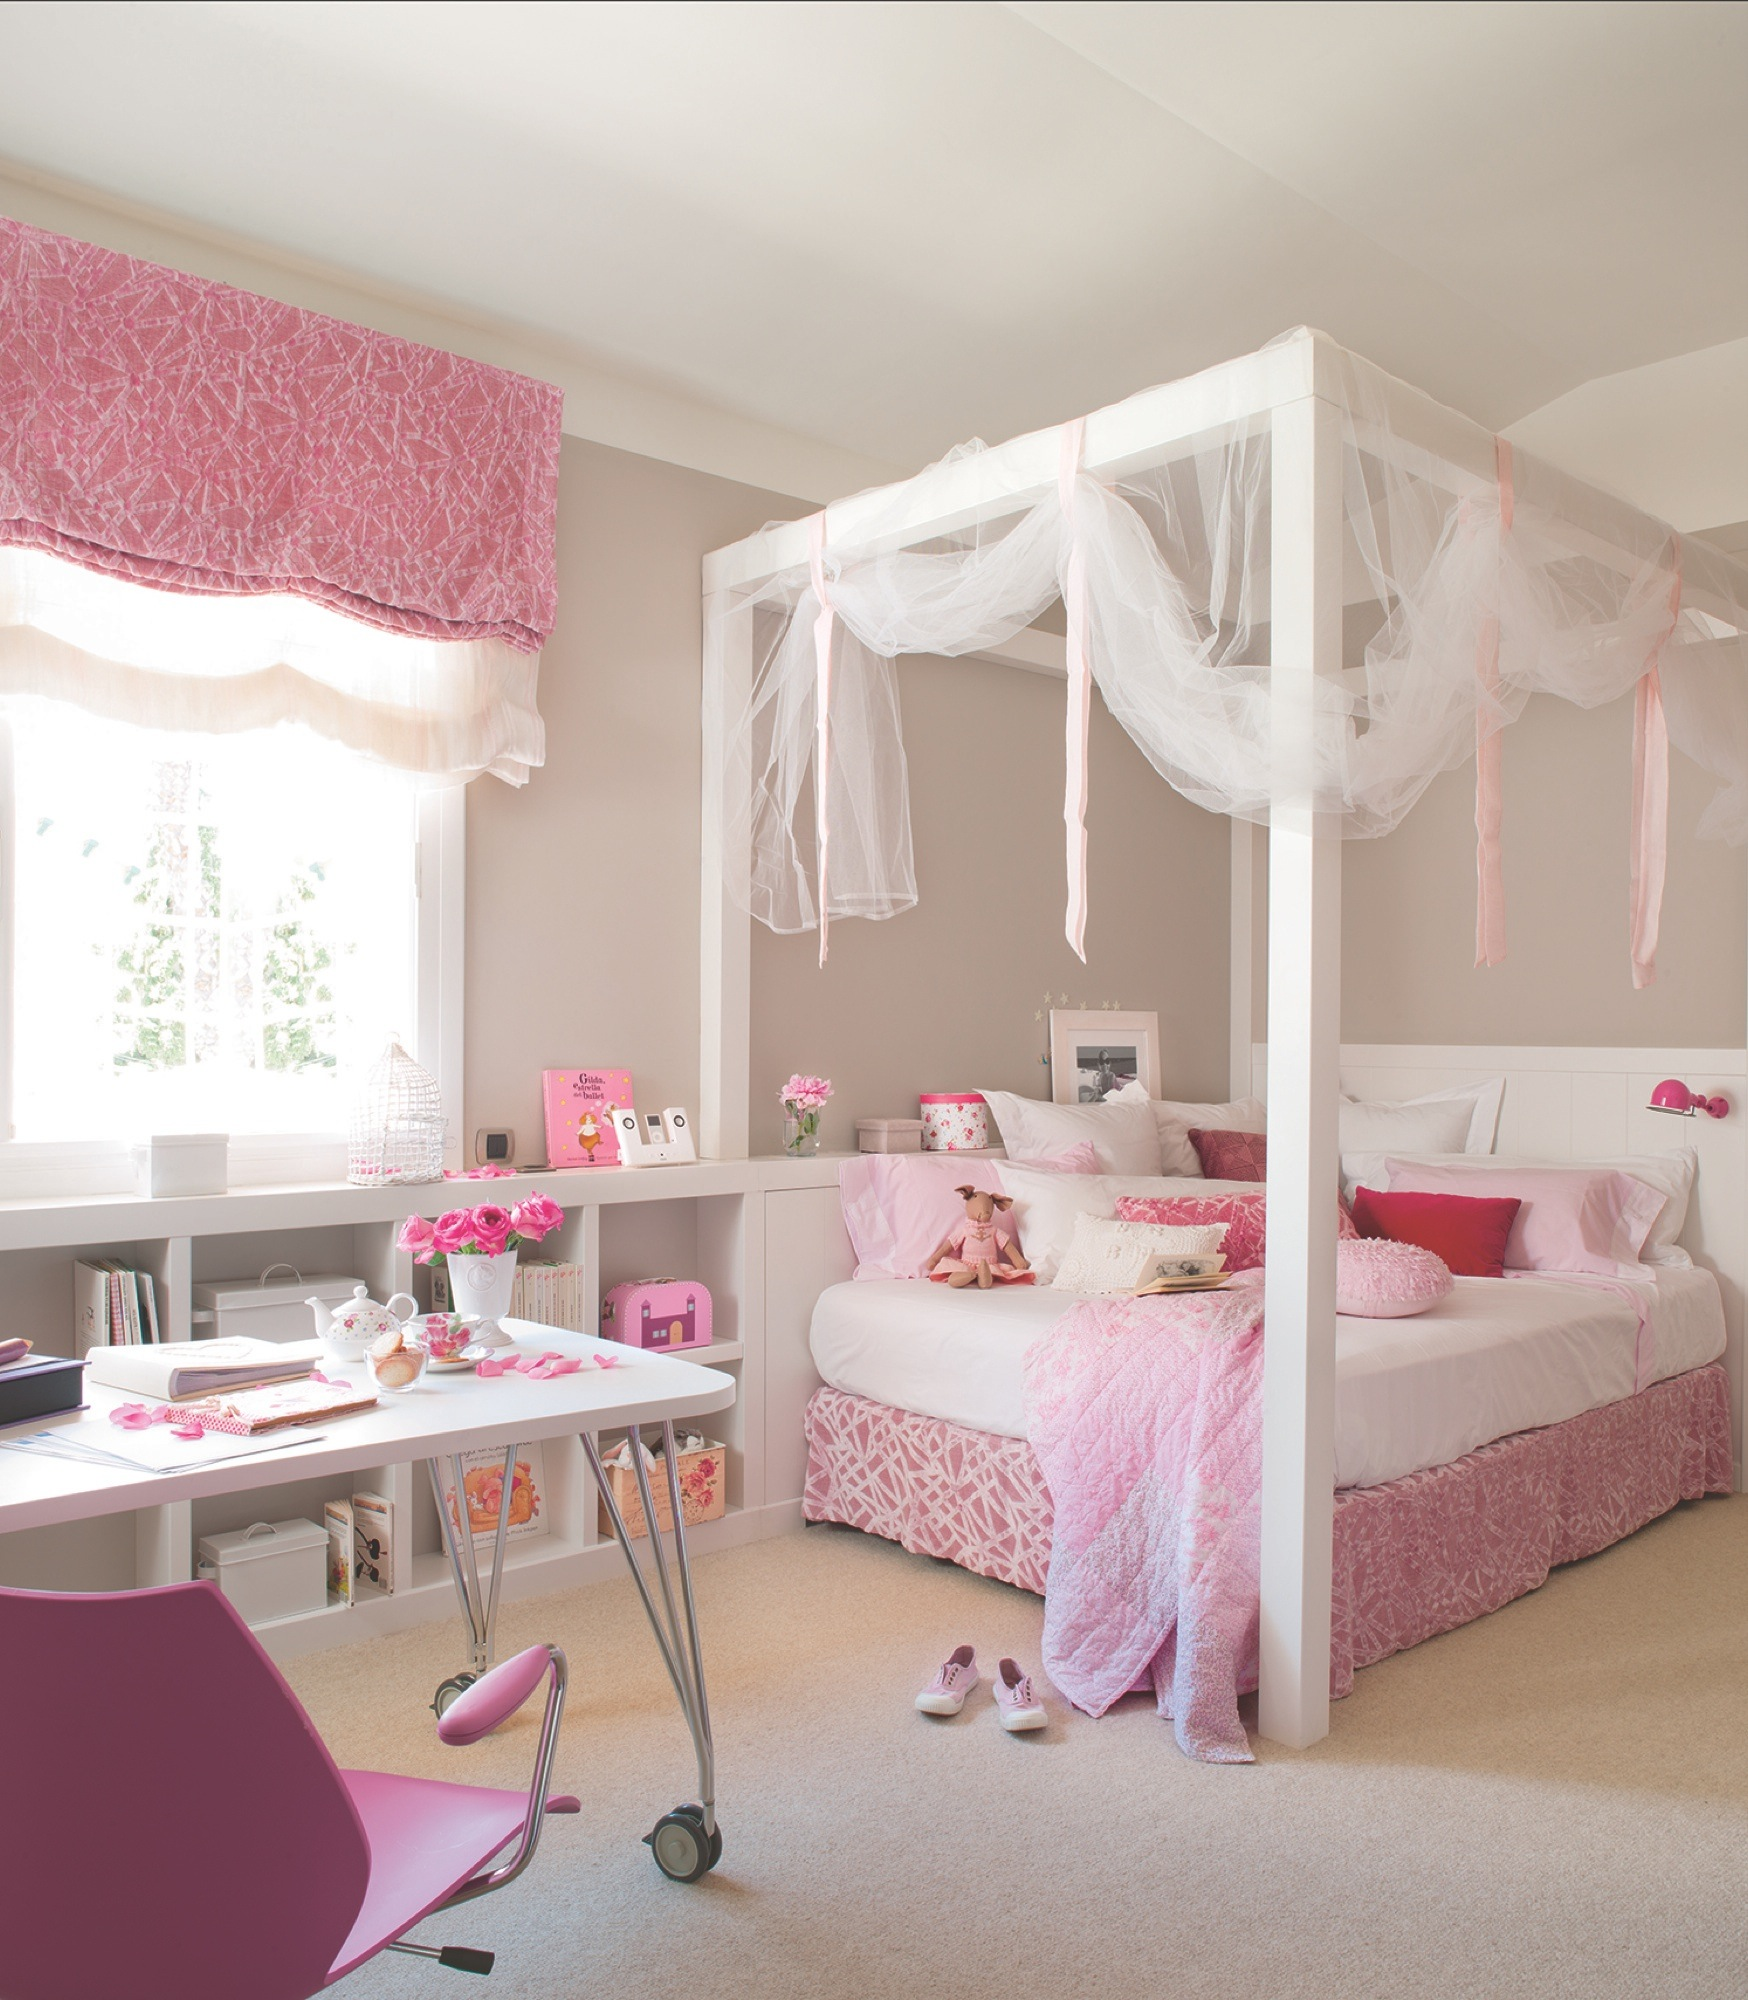 Recamara vintage rosa recmara king size en color miel for Cama divan nina